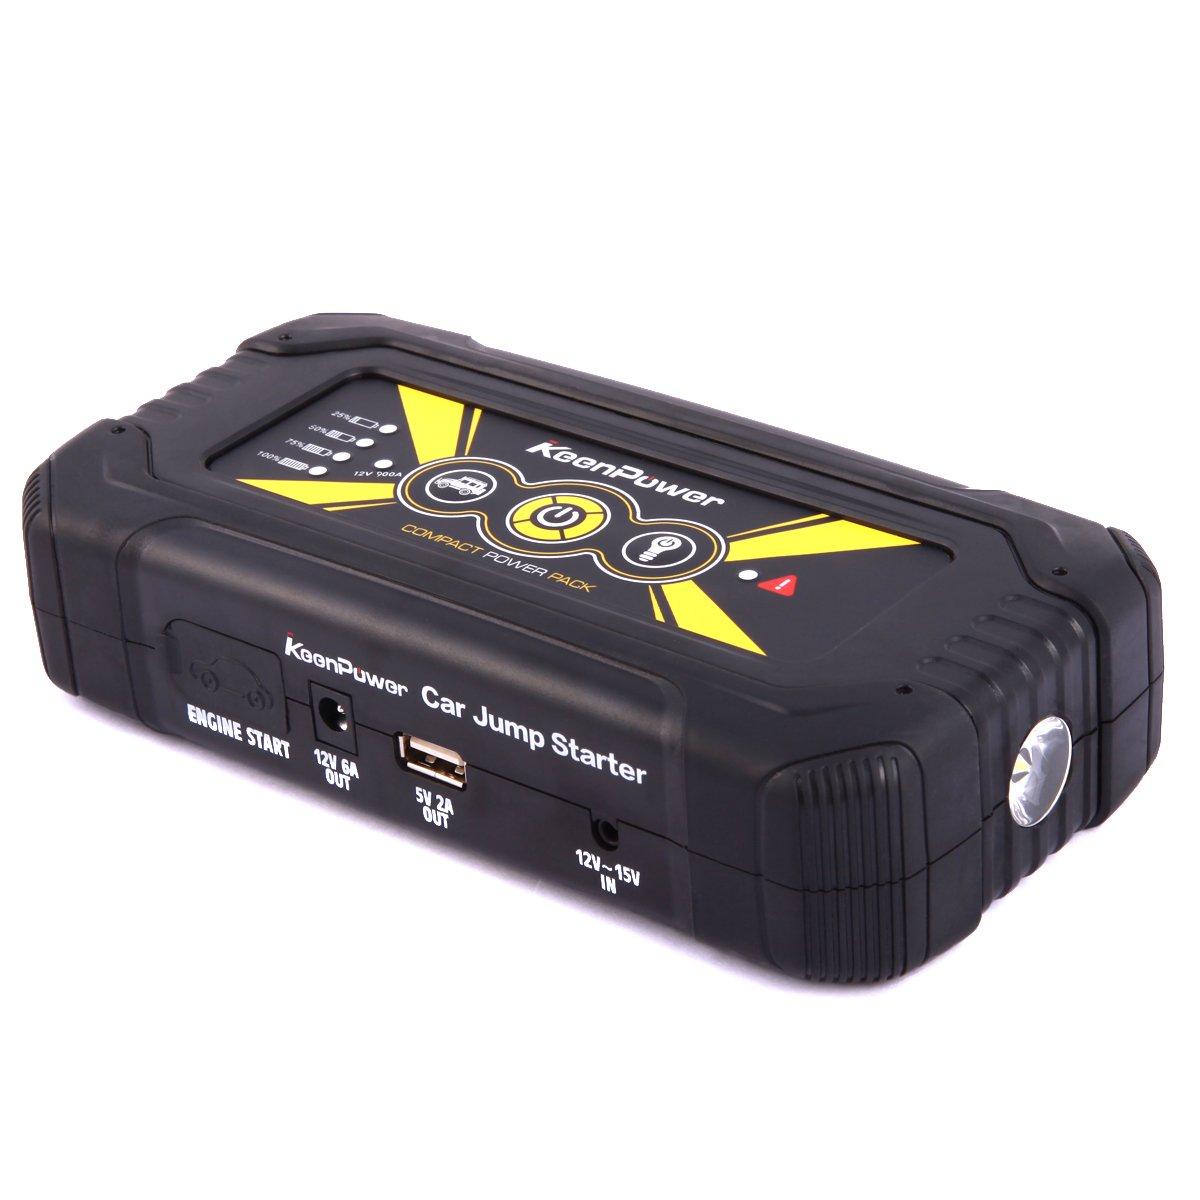 Keenpower Mini Tragbar Auto Starthilfe 12V Auto-Styling Start Gerä t Ladegerä t Autobatterie 600A Booster Buster (600A ROT)